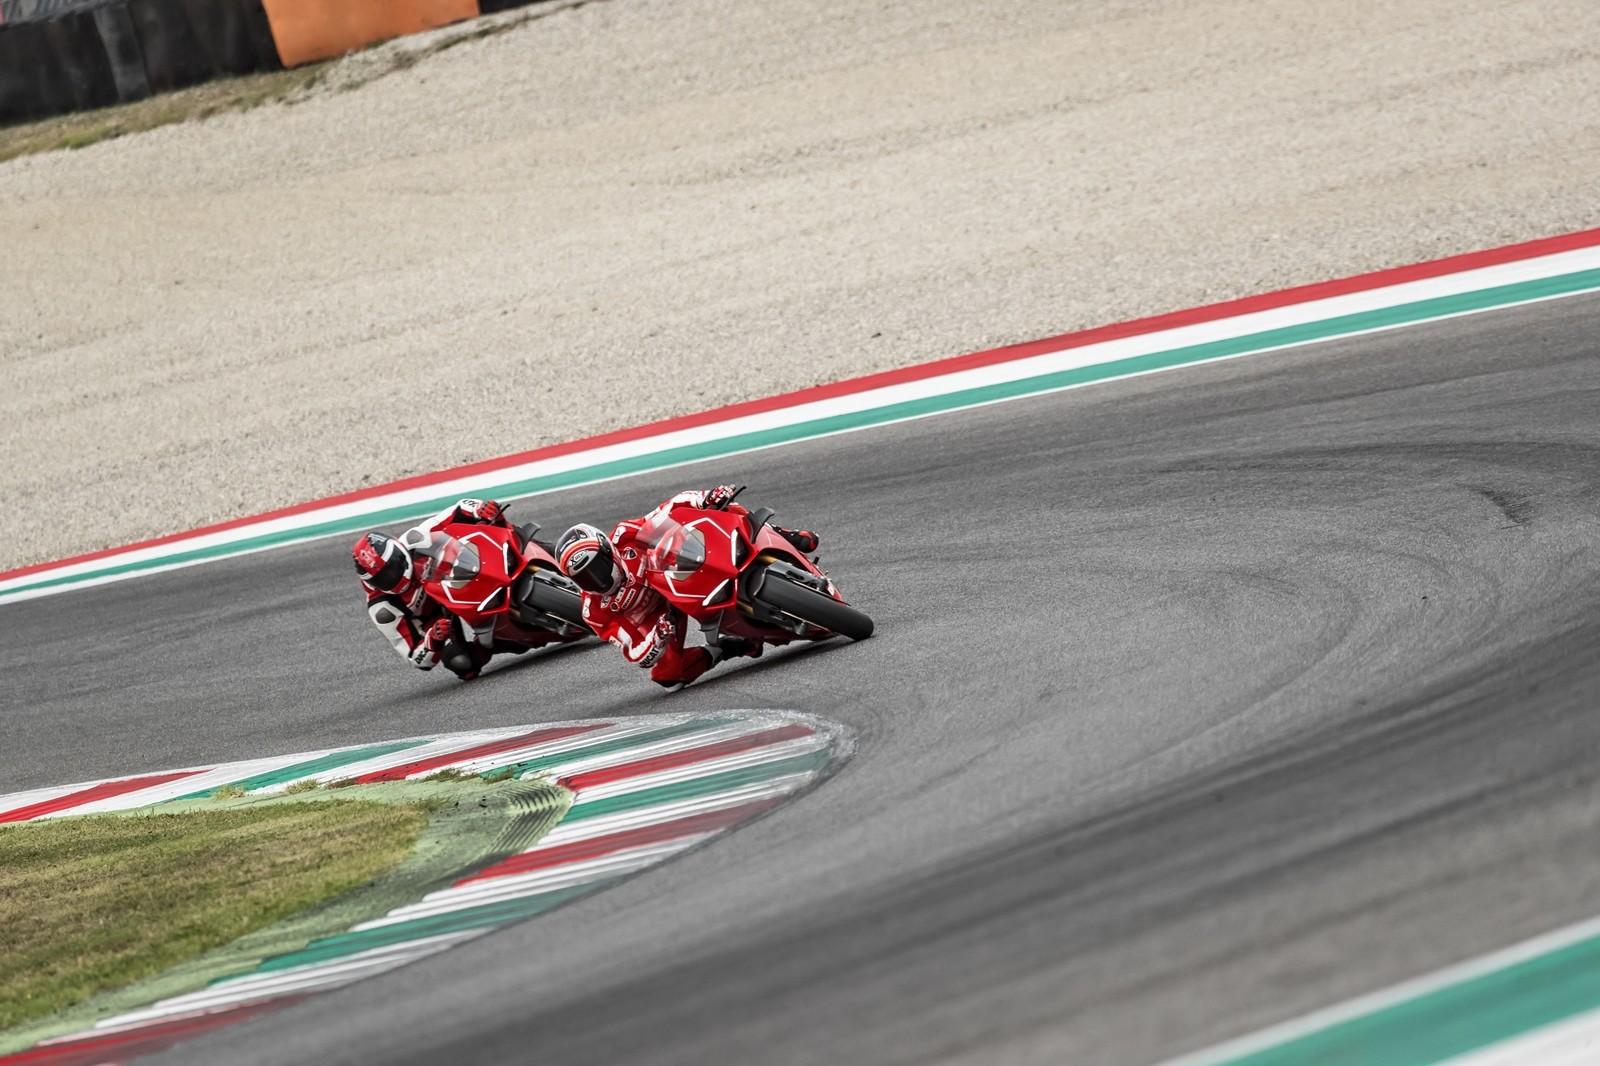 Ducati Panigale V4 R 2019